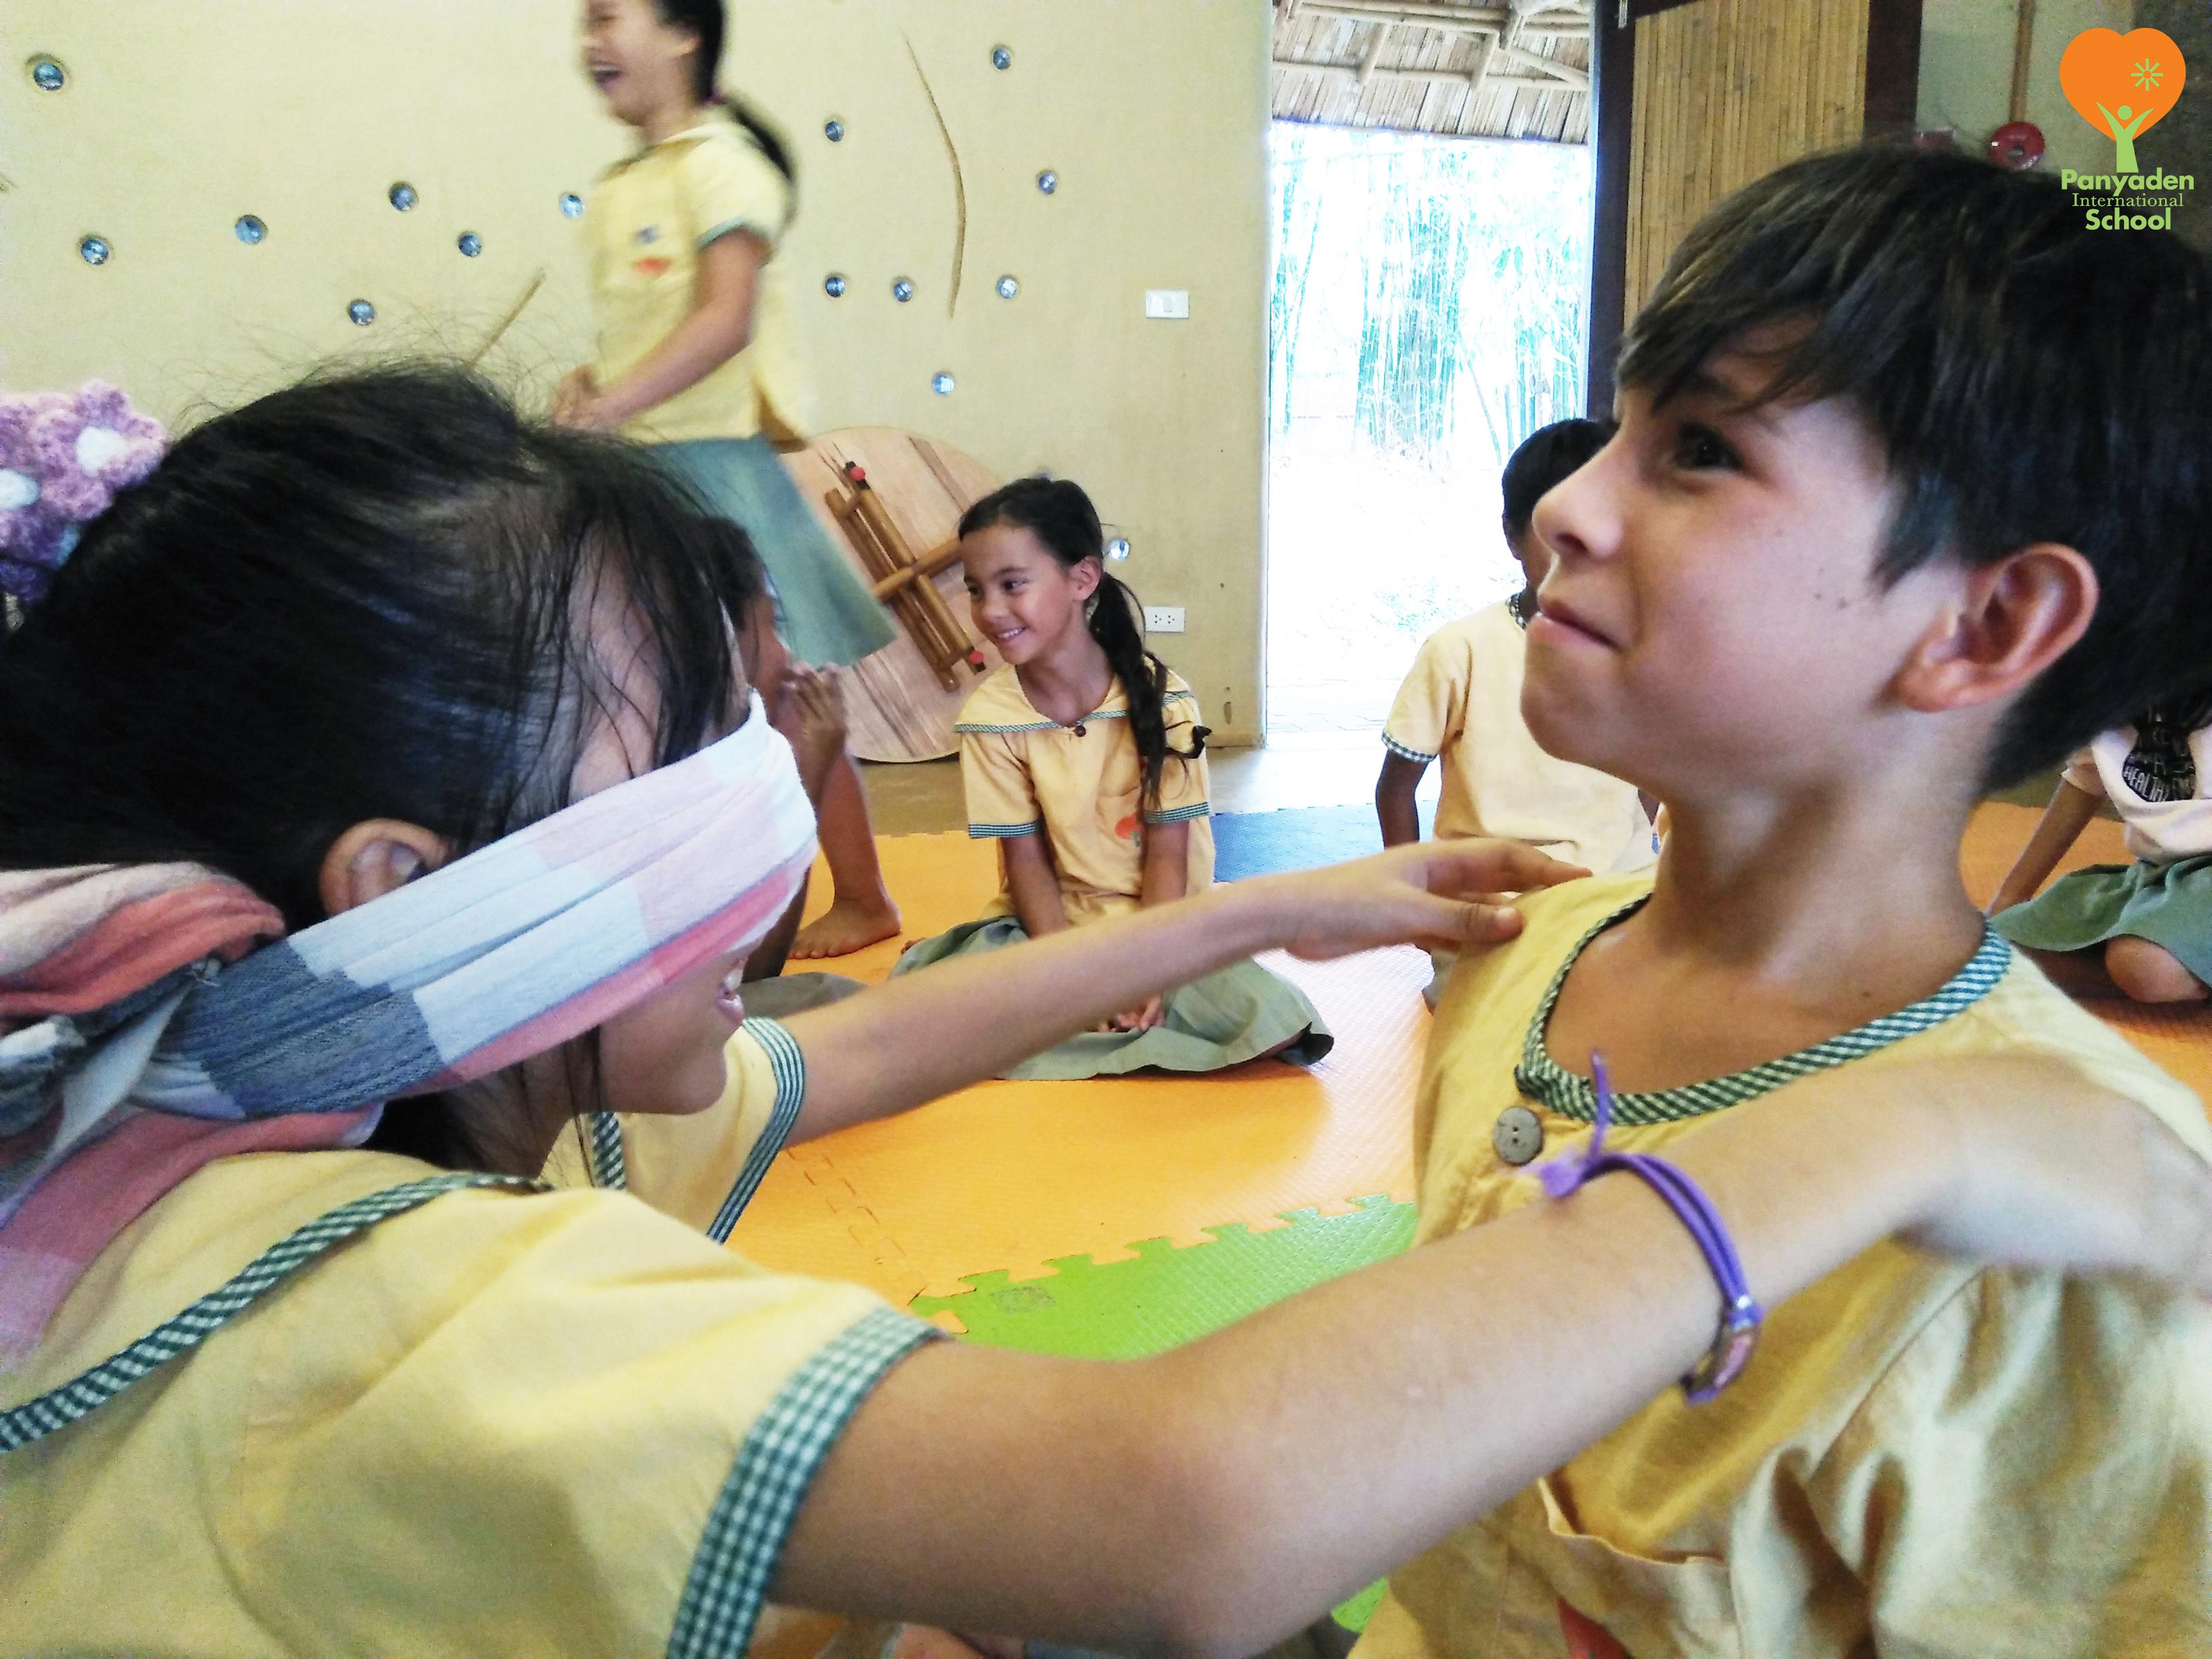 Panyaden Year 4 performing arts class, building empathy